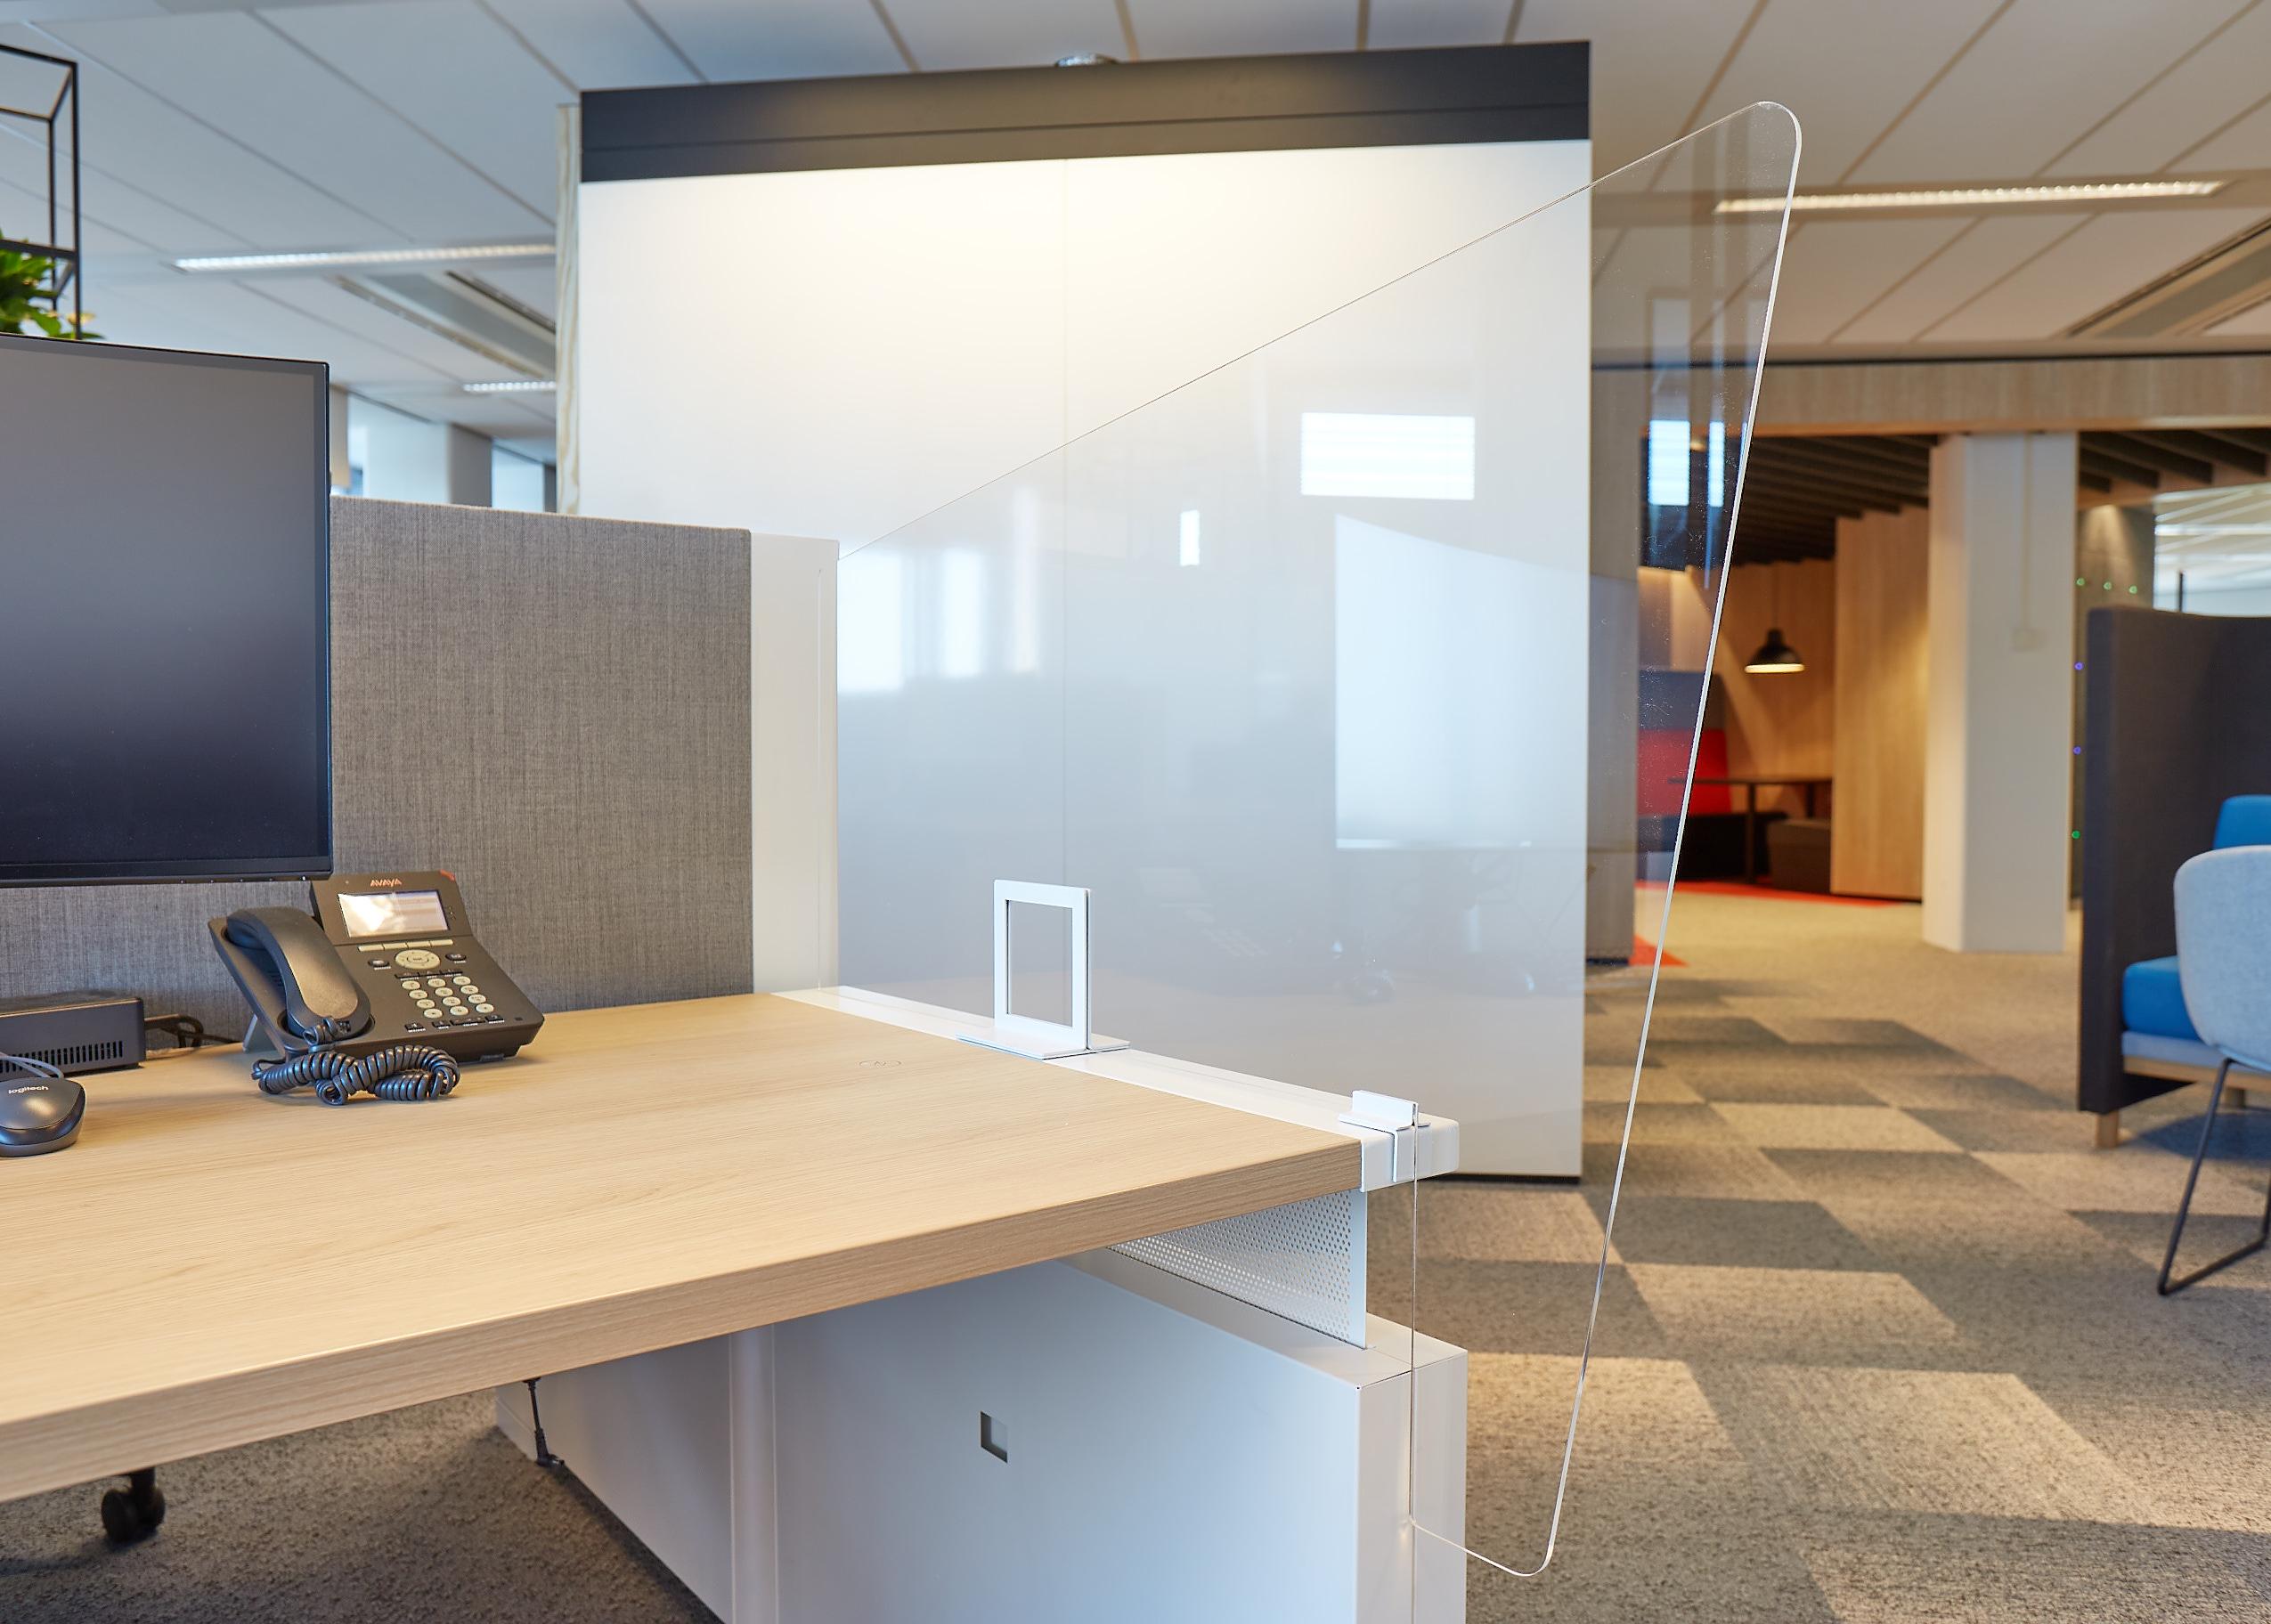 Design Djunky transparante schermen Rock